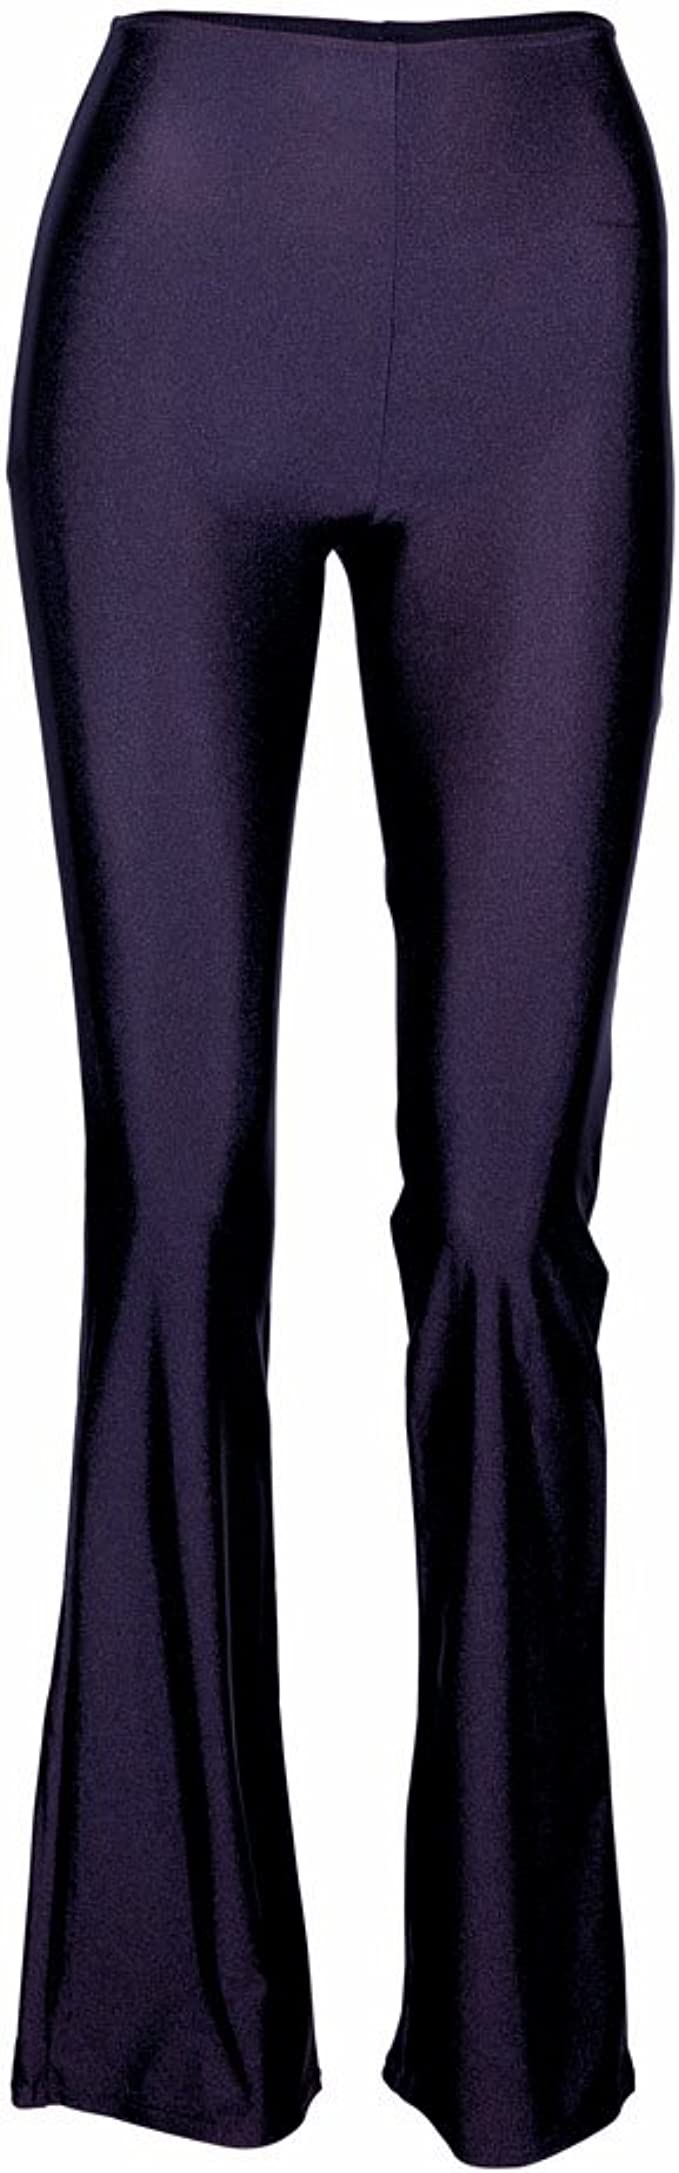 Black Starlite Jazz Pants Dance size 5